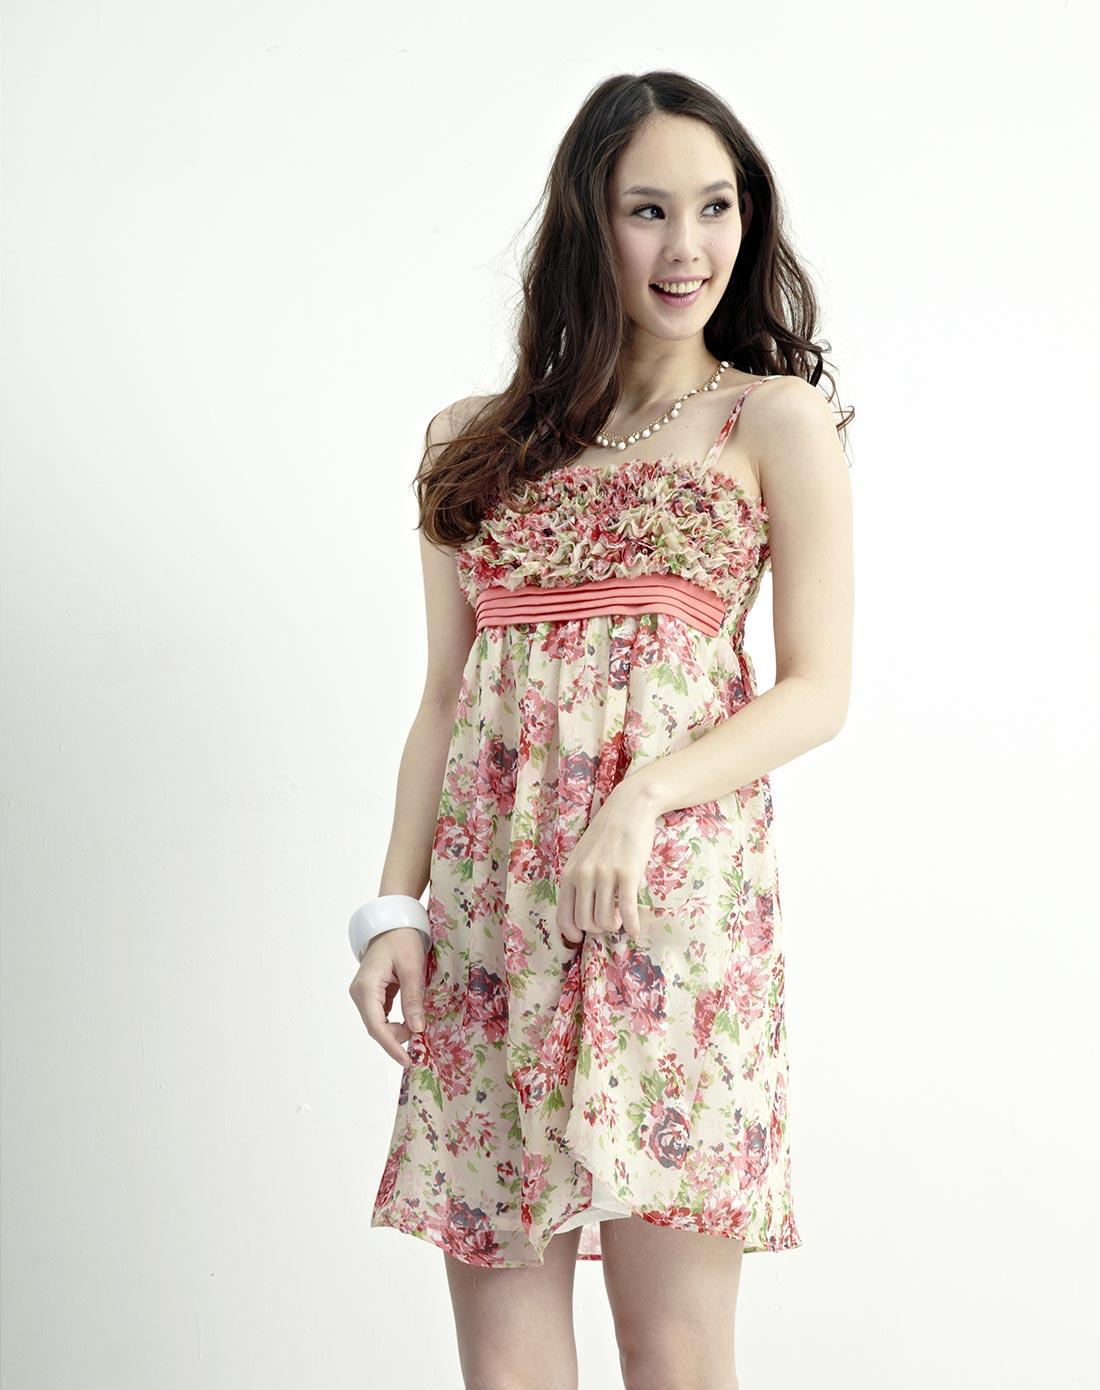 lisa米色抹胸裙as317170图片